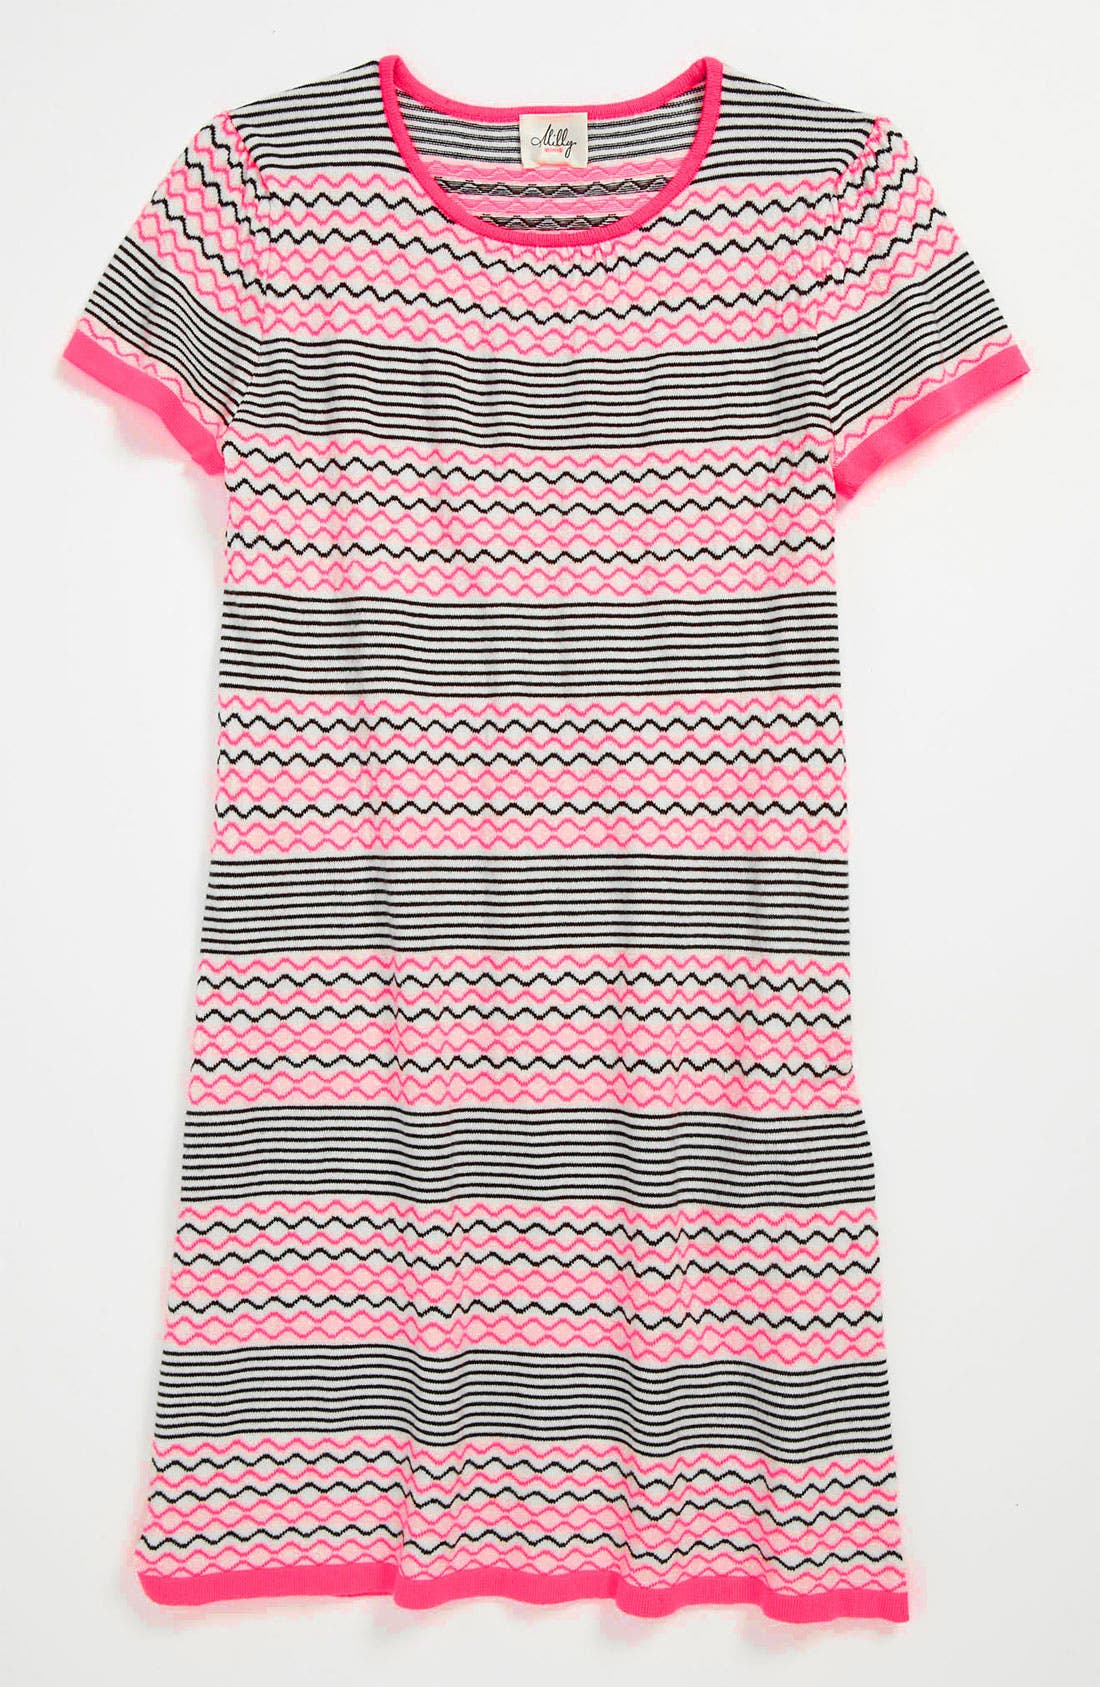 Alternate Image 1 Selected - Milly Minis Knit Dress (Little Girls & Big Girls)